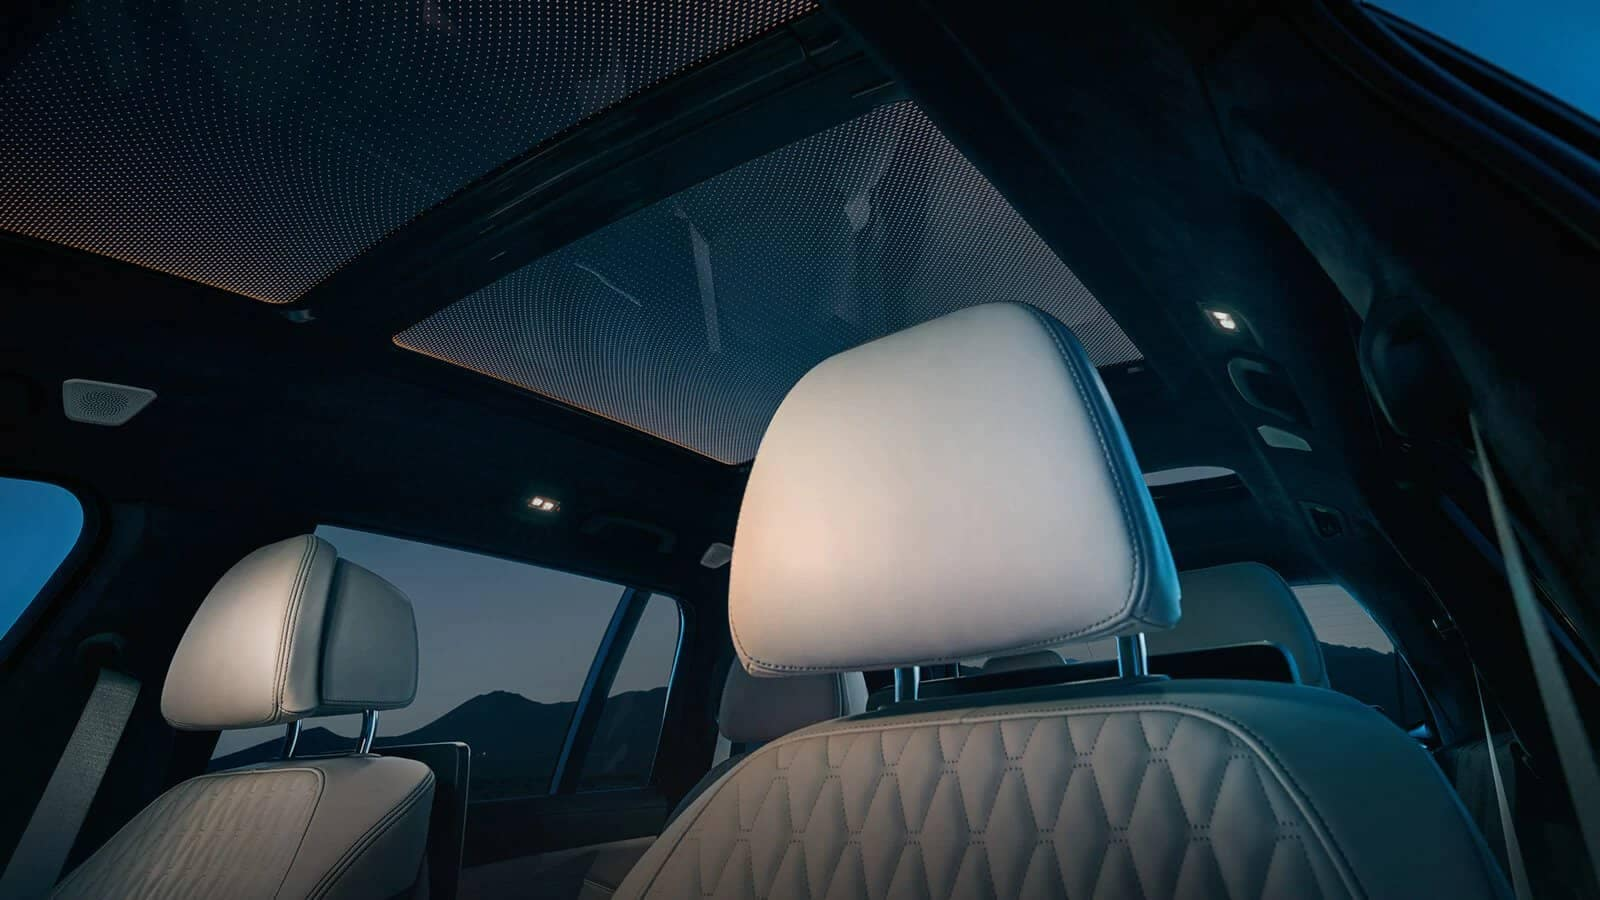 BMW X7 sunroof